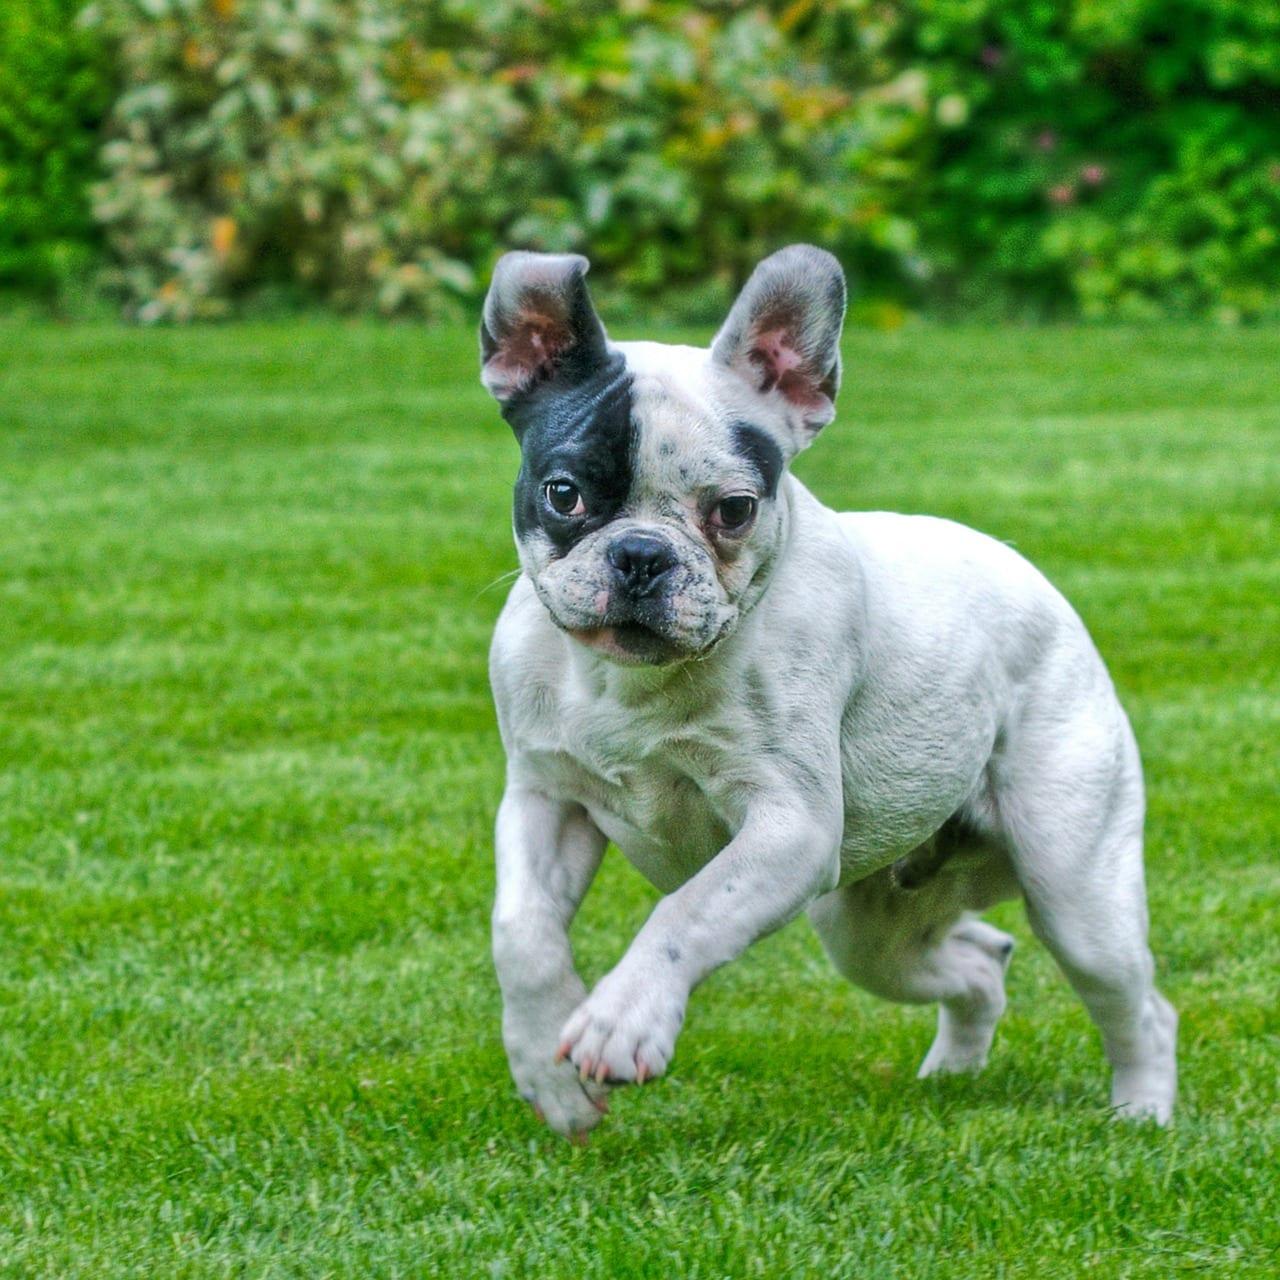 control bulldog jumping & biting